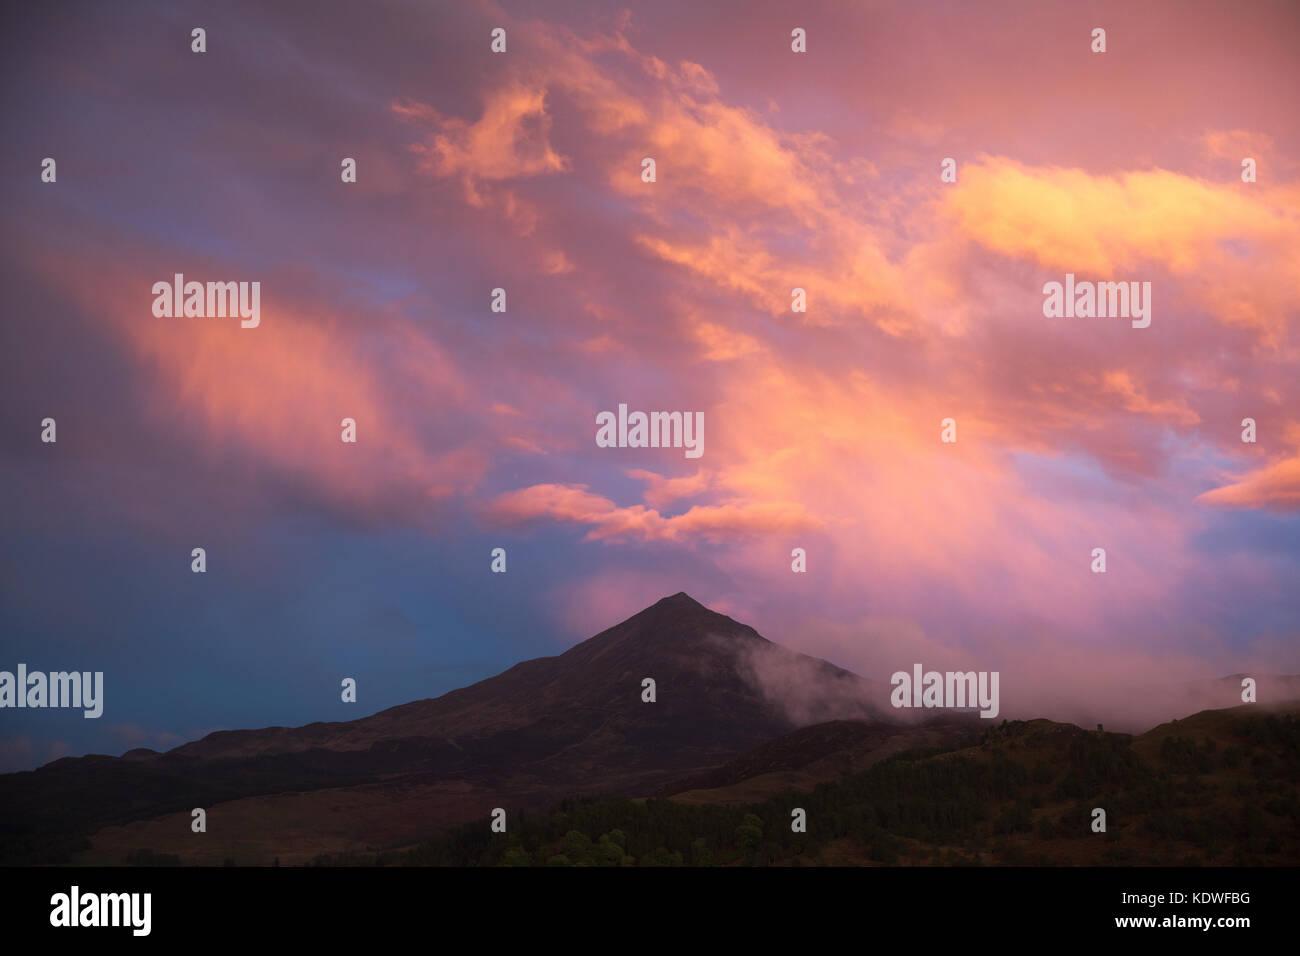 Twilight over Schiehallion, Loch Rannoch, Perthshire, Scotland, UK - Stock Image